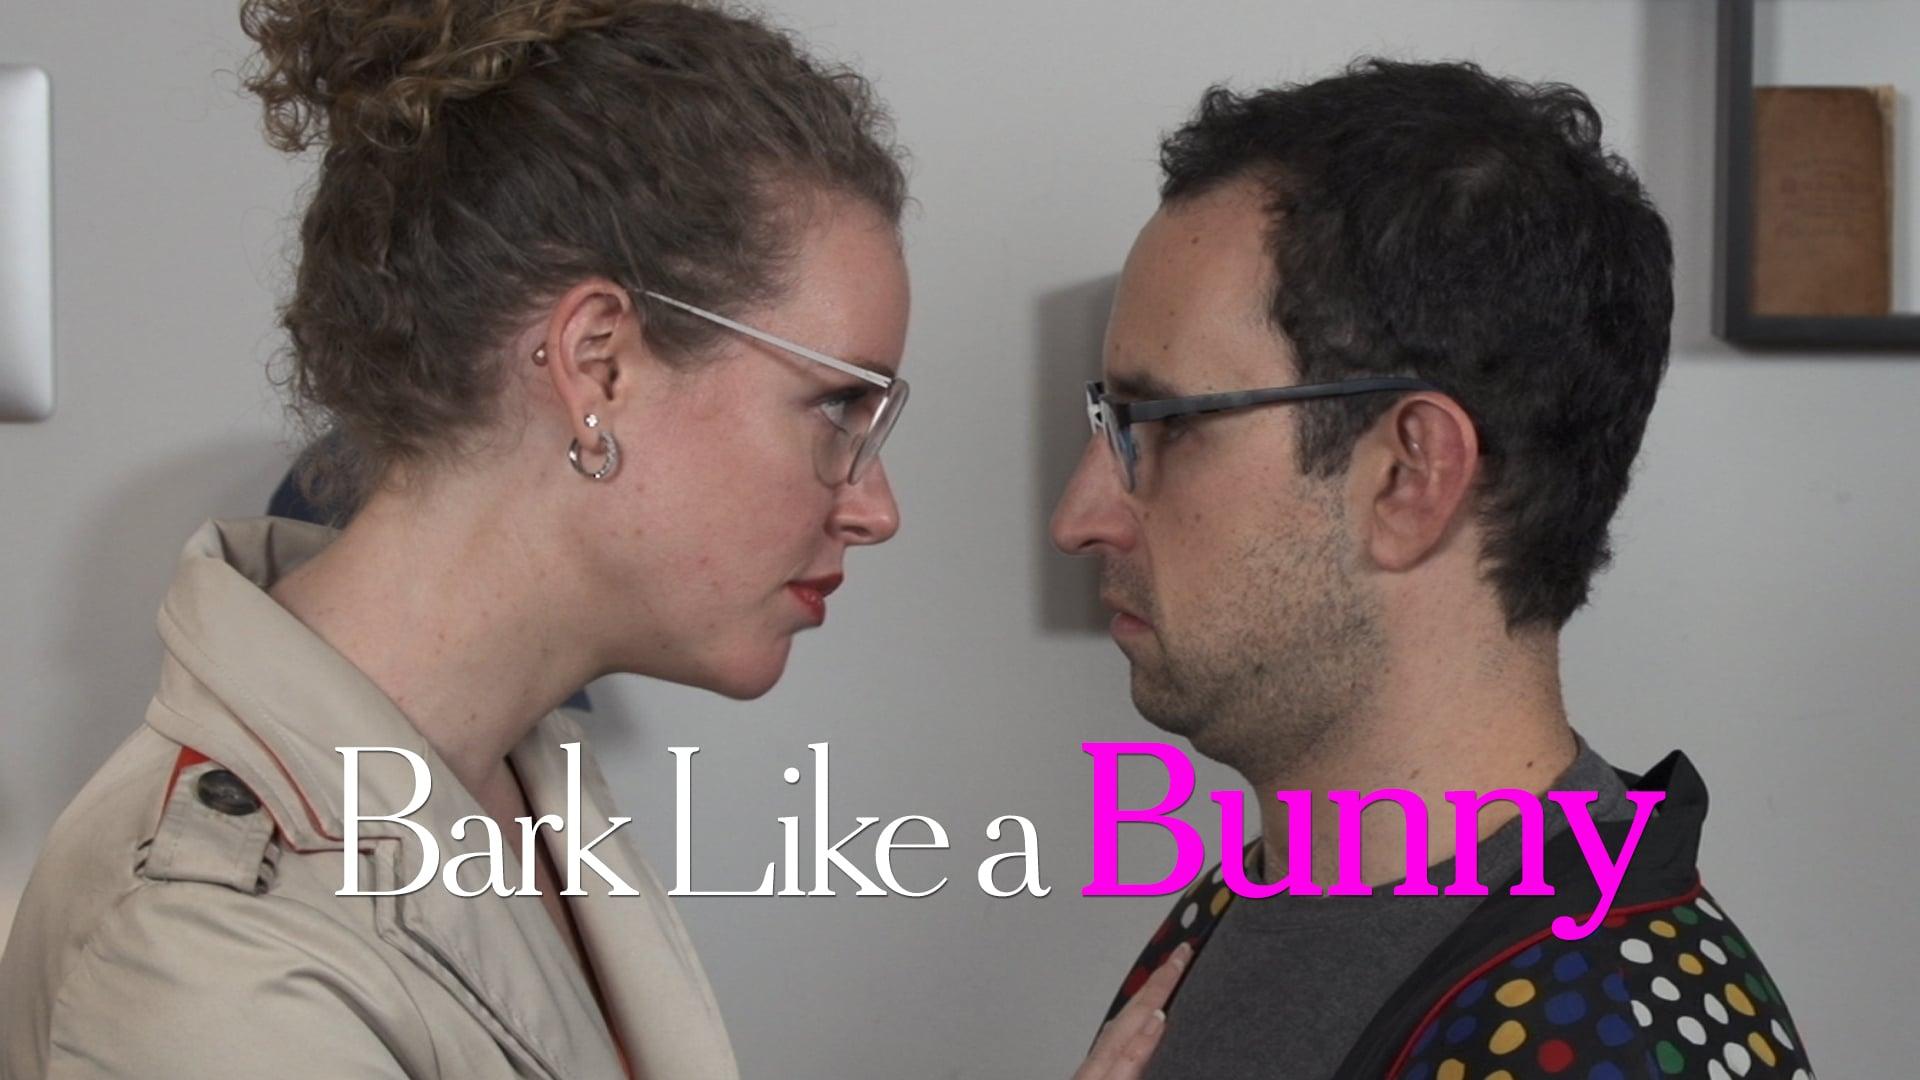 Bark Like a Bunny - Promo